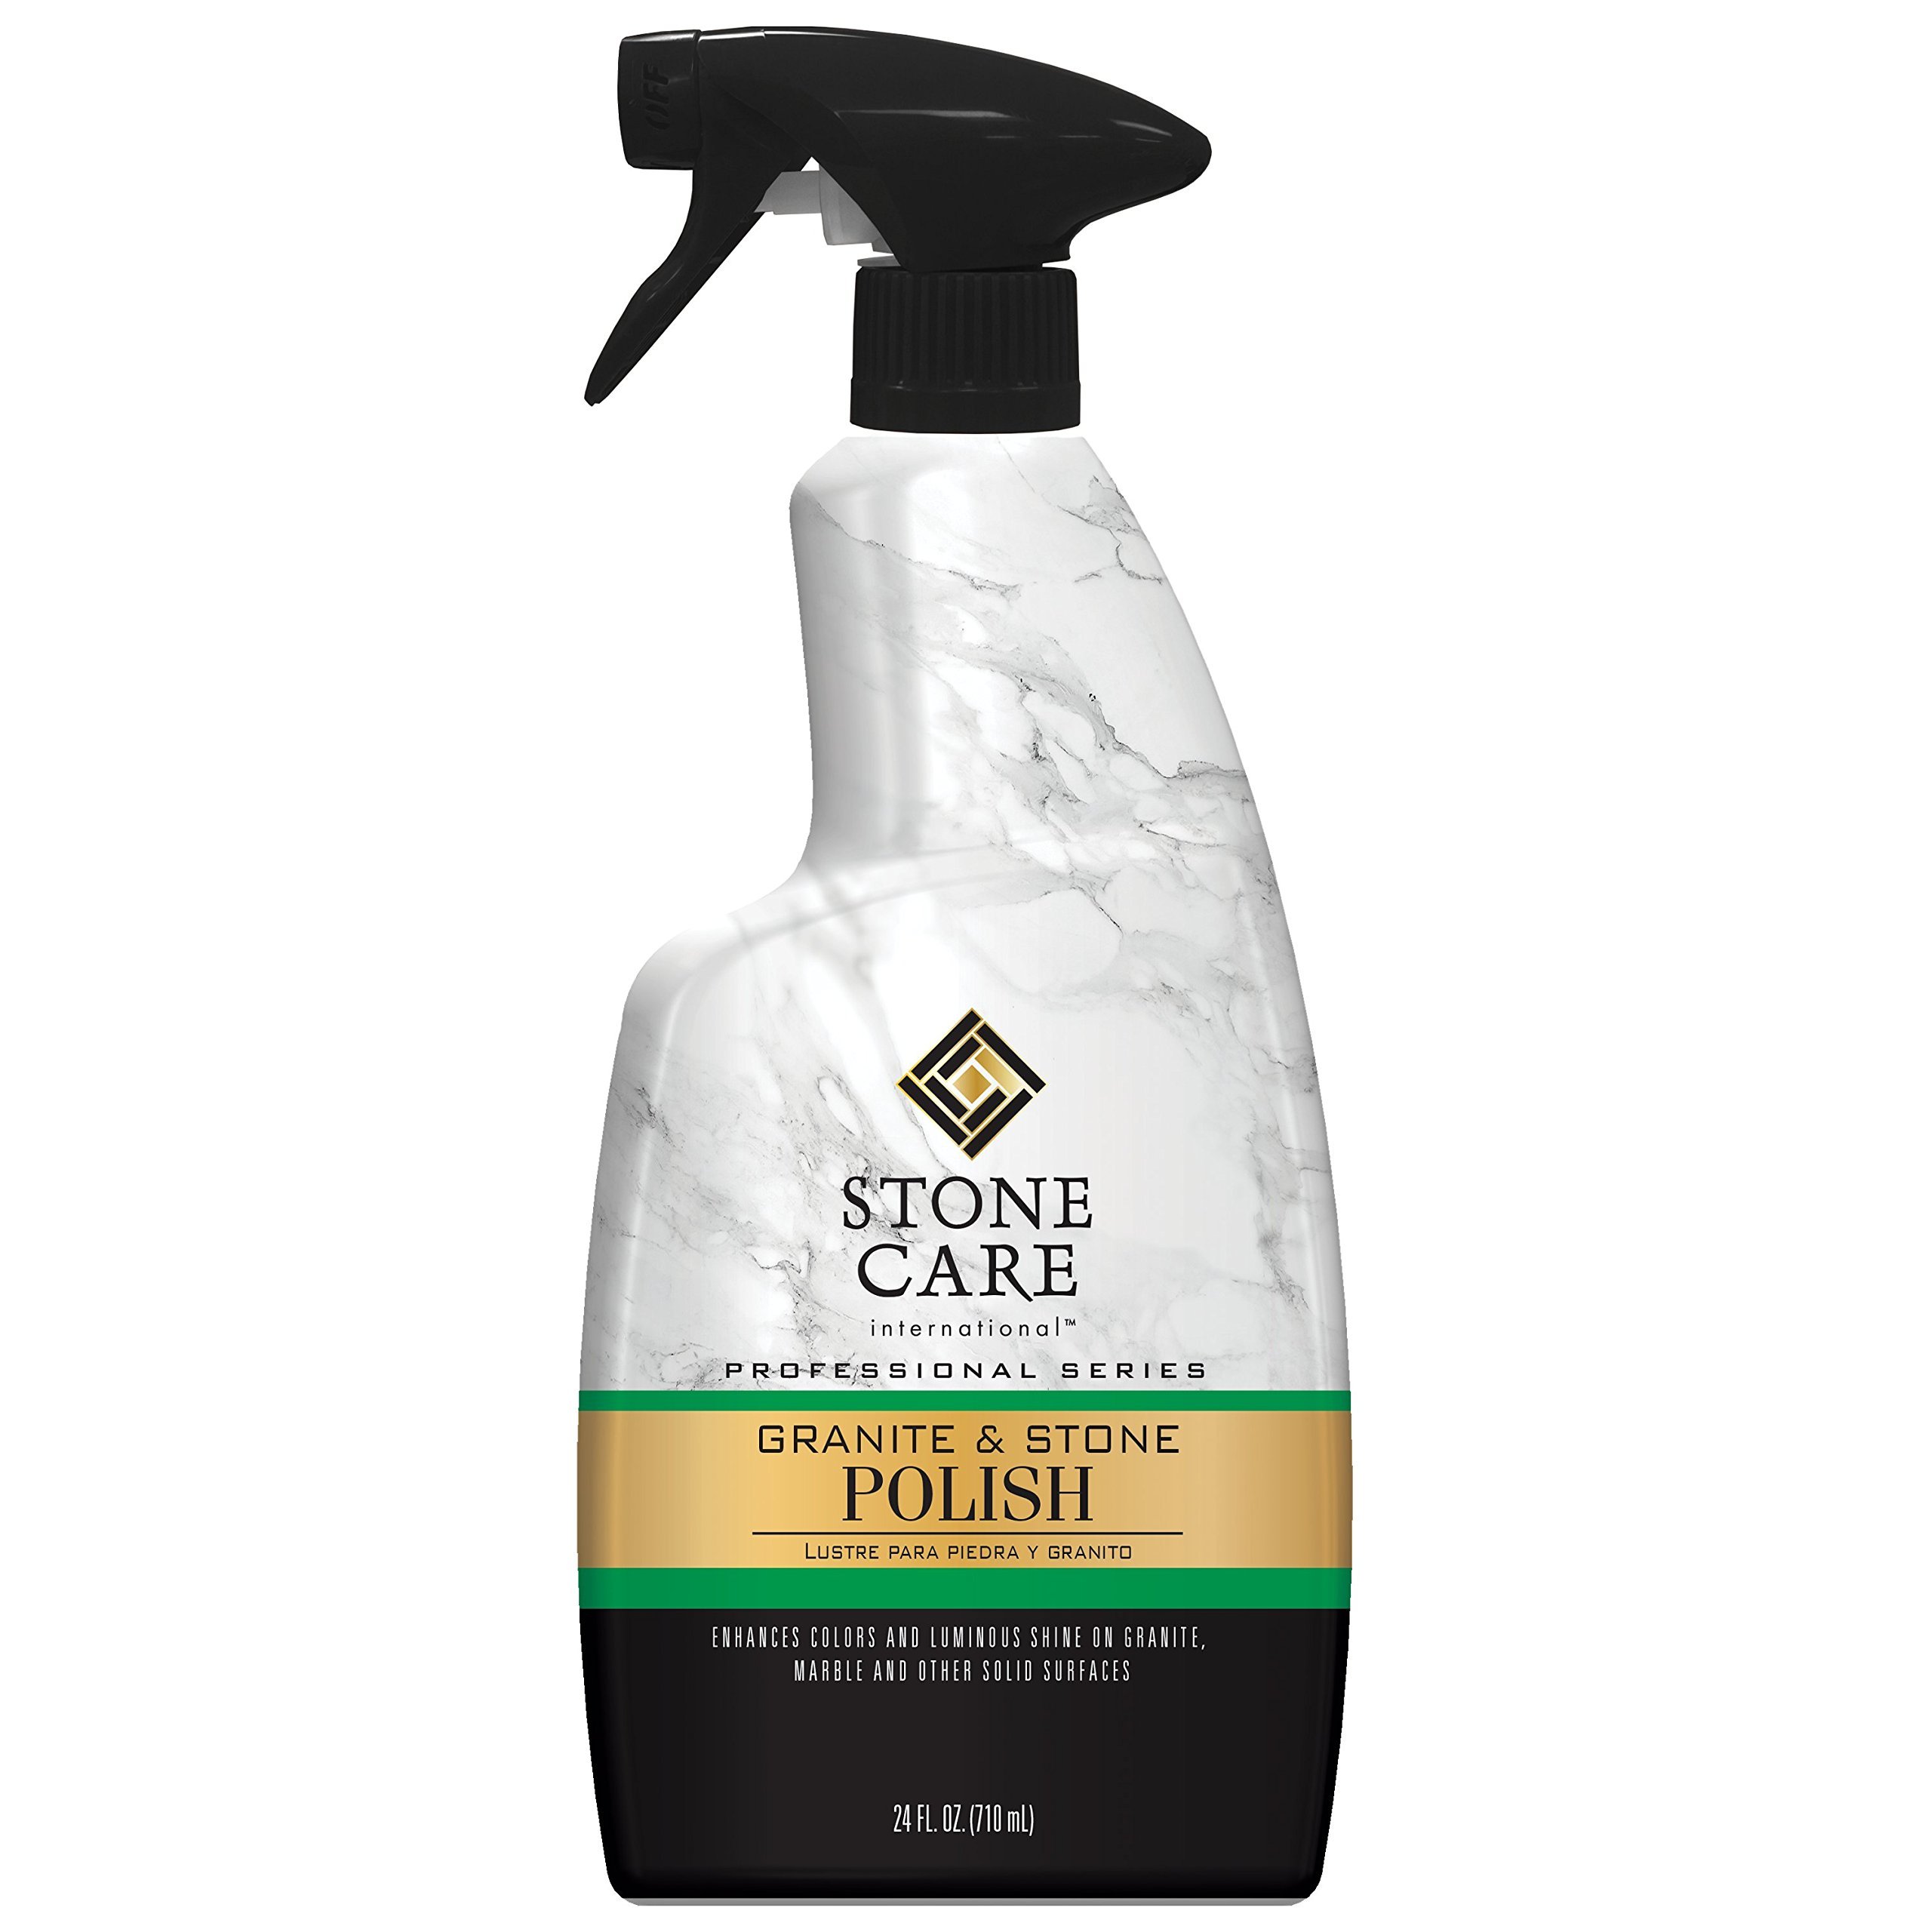 Stone Care International Granite Stone Polish - 24 Ounce - for Granite Marble Soapstone Quartz Quartzite Slate Limestone Corian Laminate Tile Countertop by Stone Care International